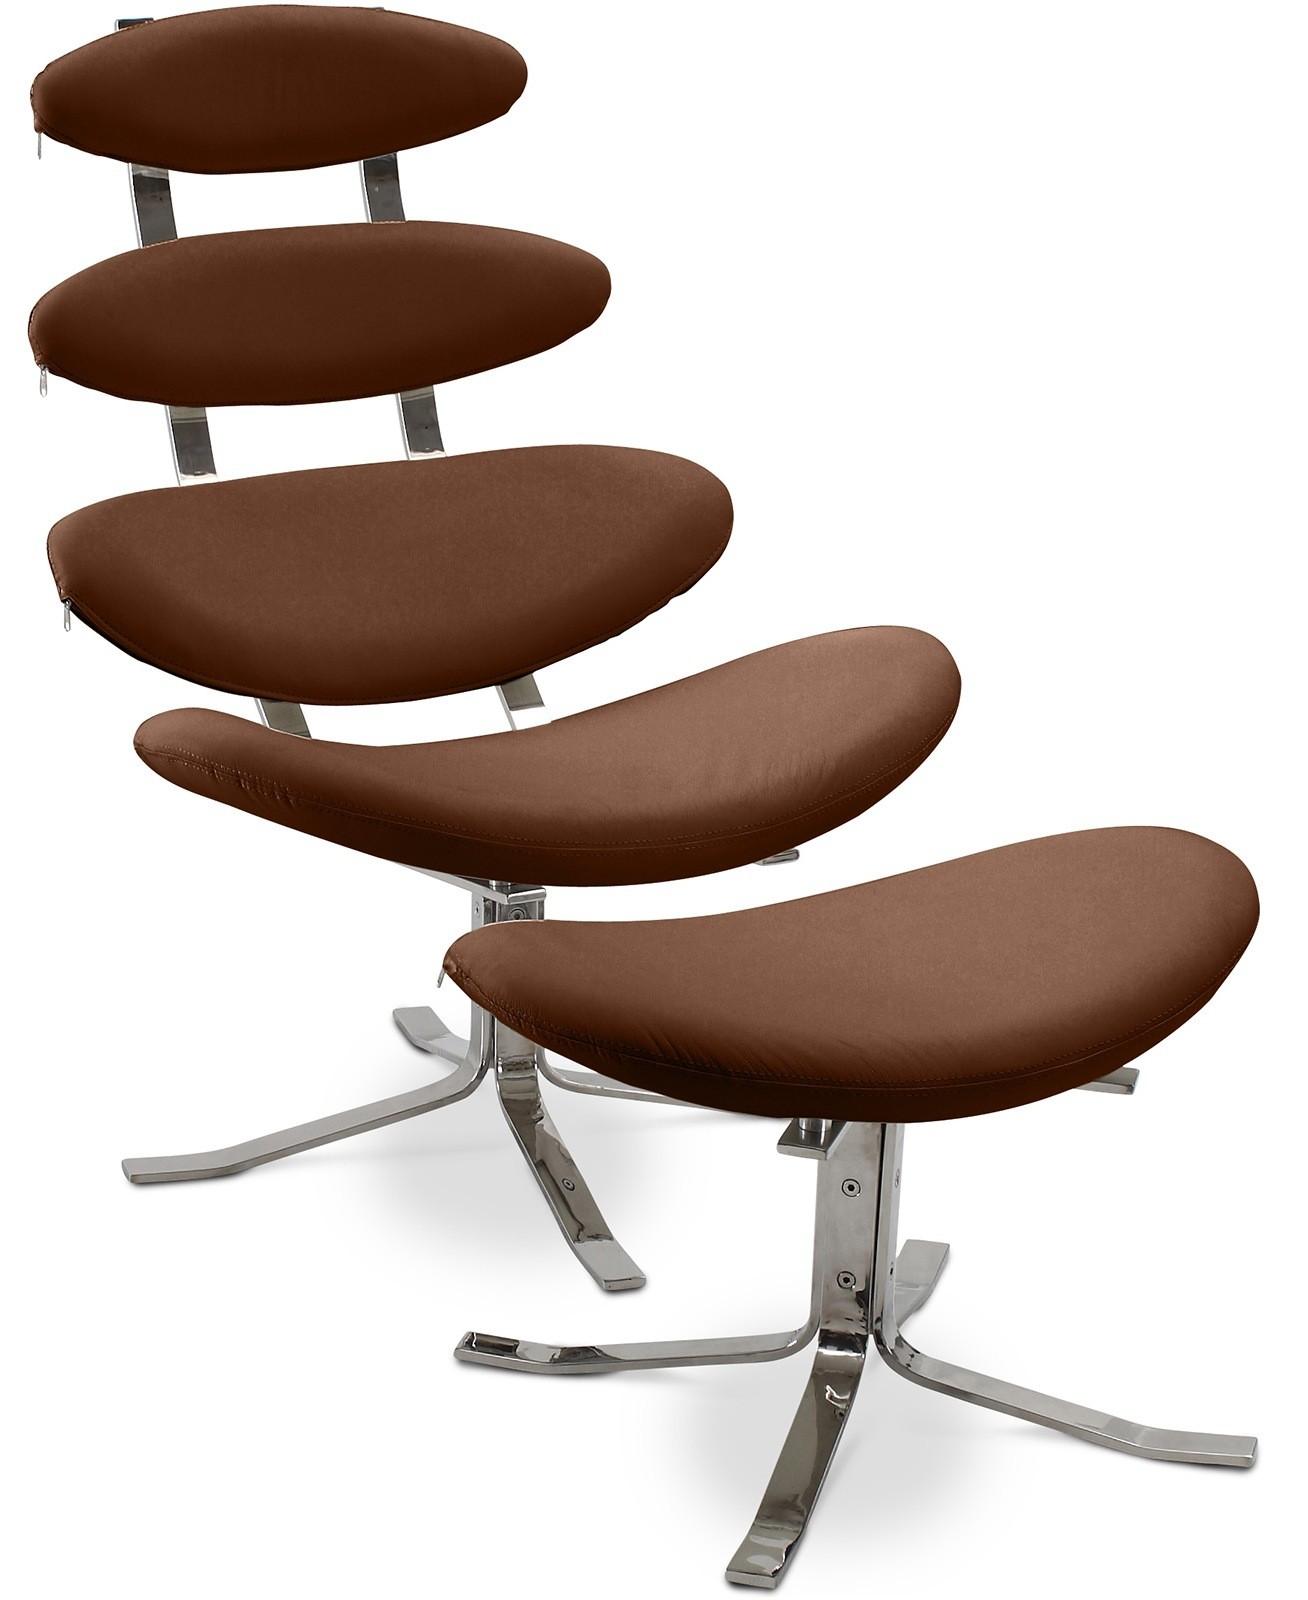 fauteuil de relaxation avec ottoman cuir chocolat inspir corona. Black Bedroom Furniture Sets. Home Design Ideas